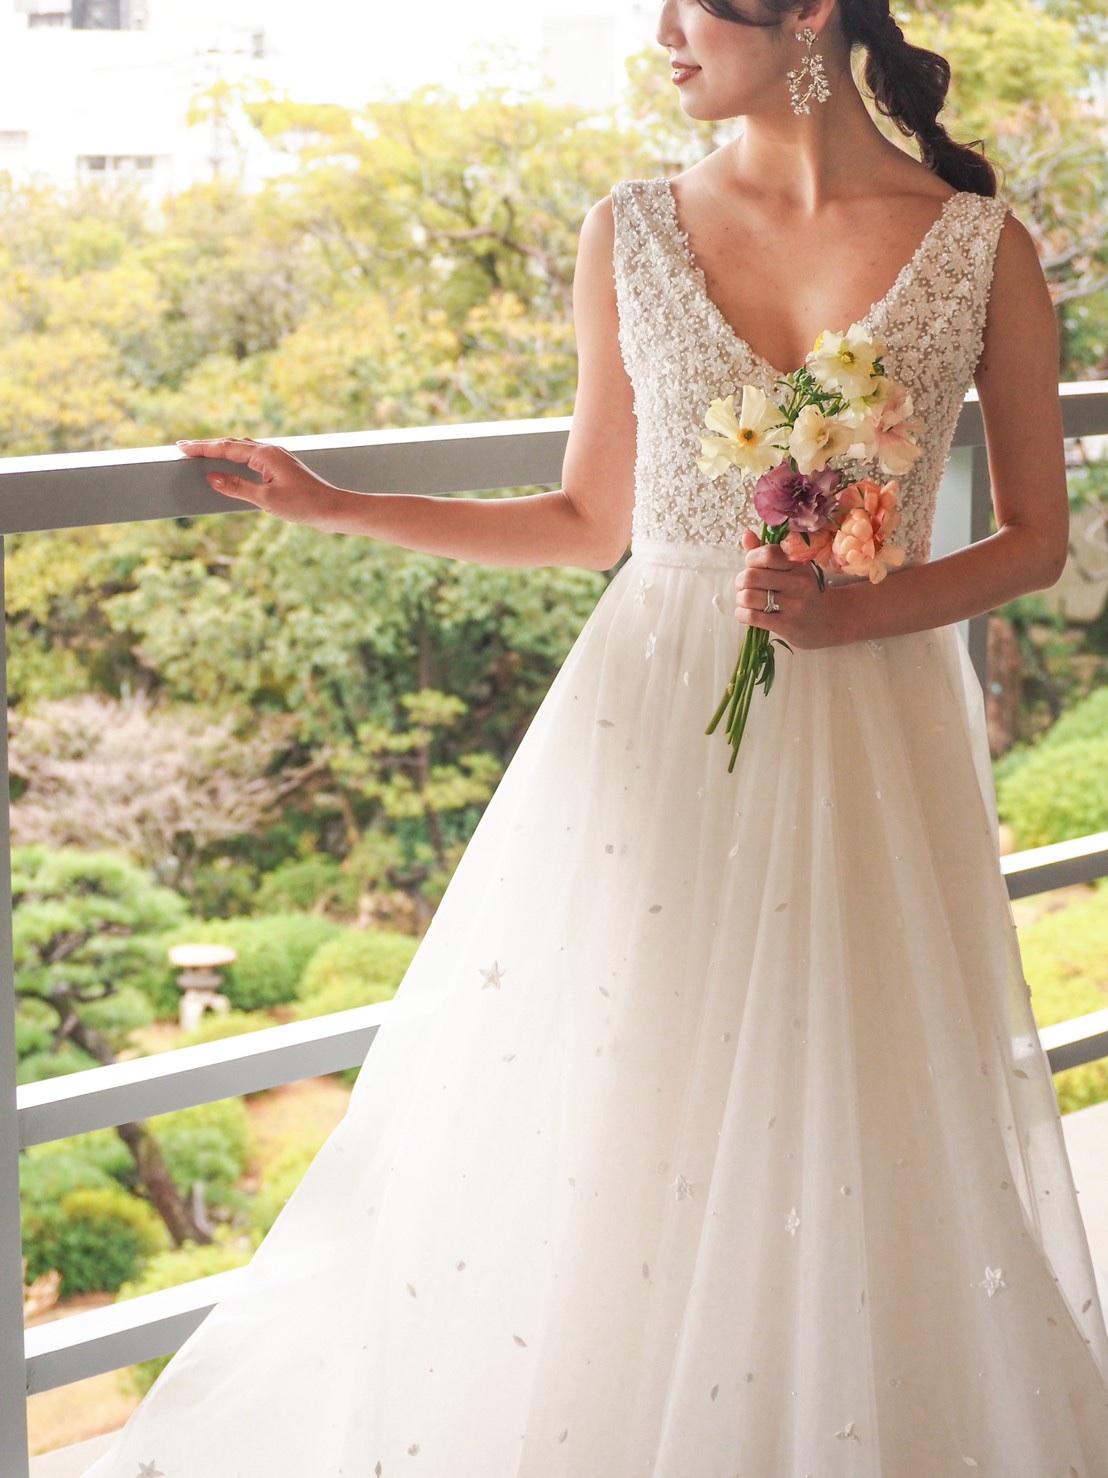 THE TREAT DRESSING神戸店が相楽園の結婚式におすすめするリーム・アクラのフラワービジューがちりばめられたVネックのウェディングドレスのご紹介